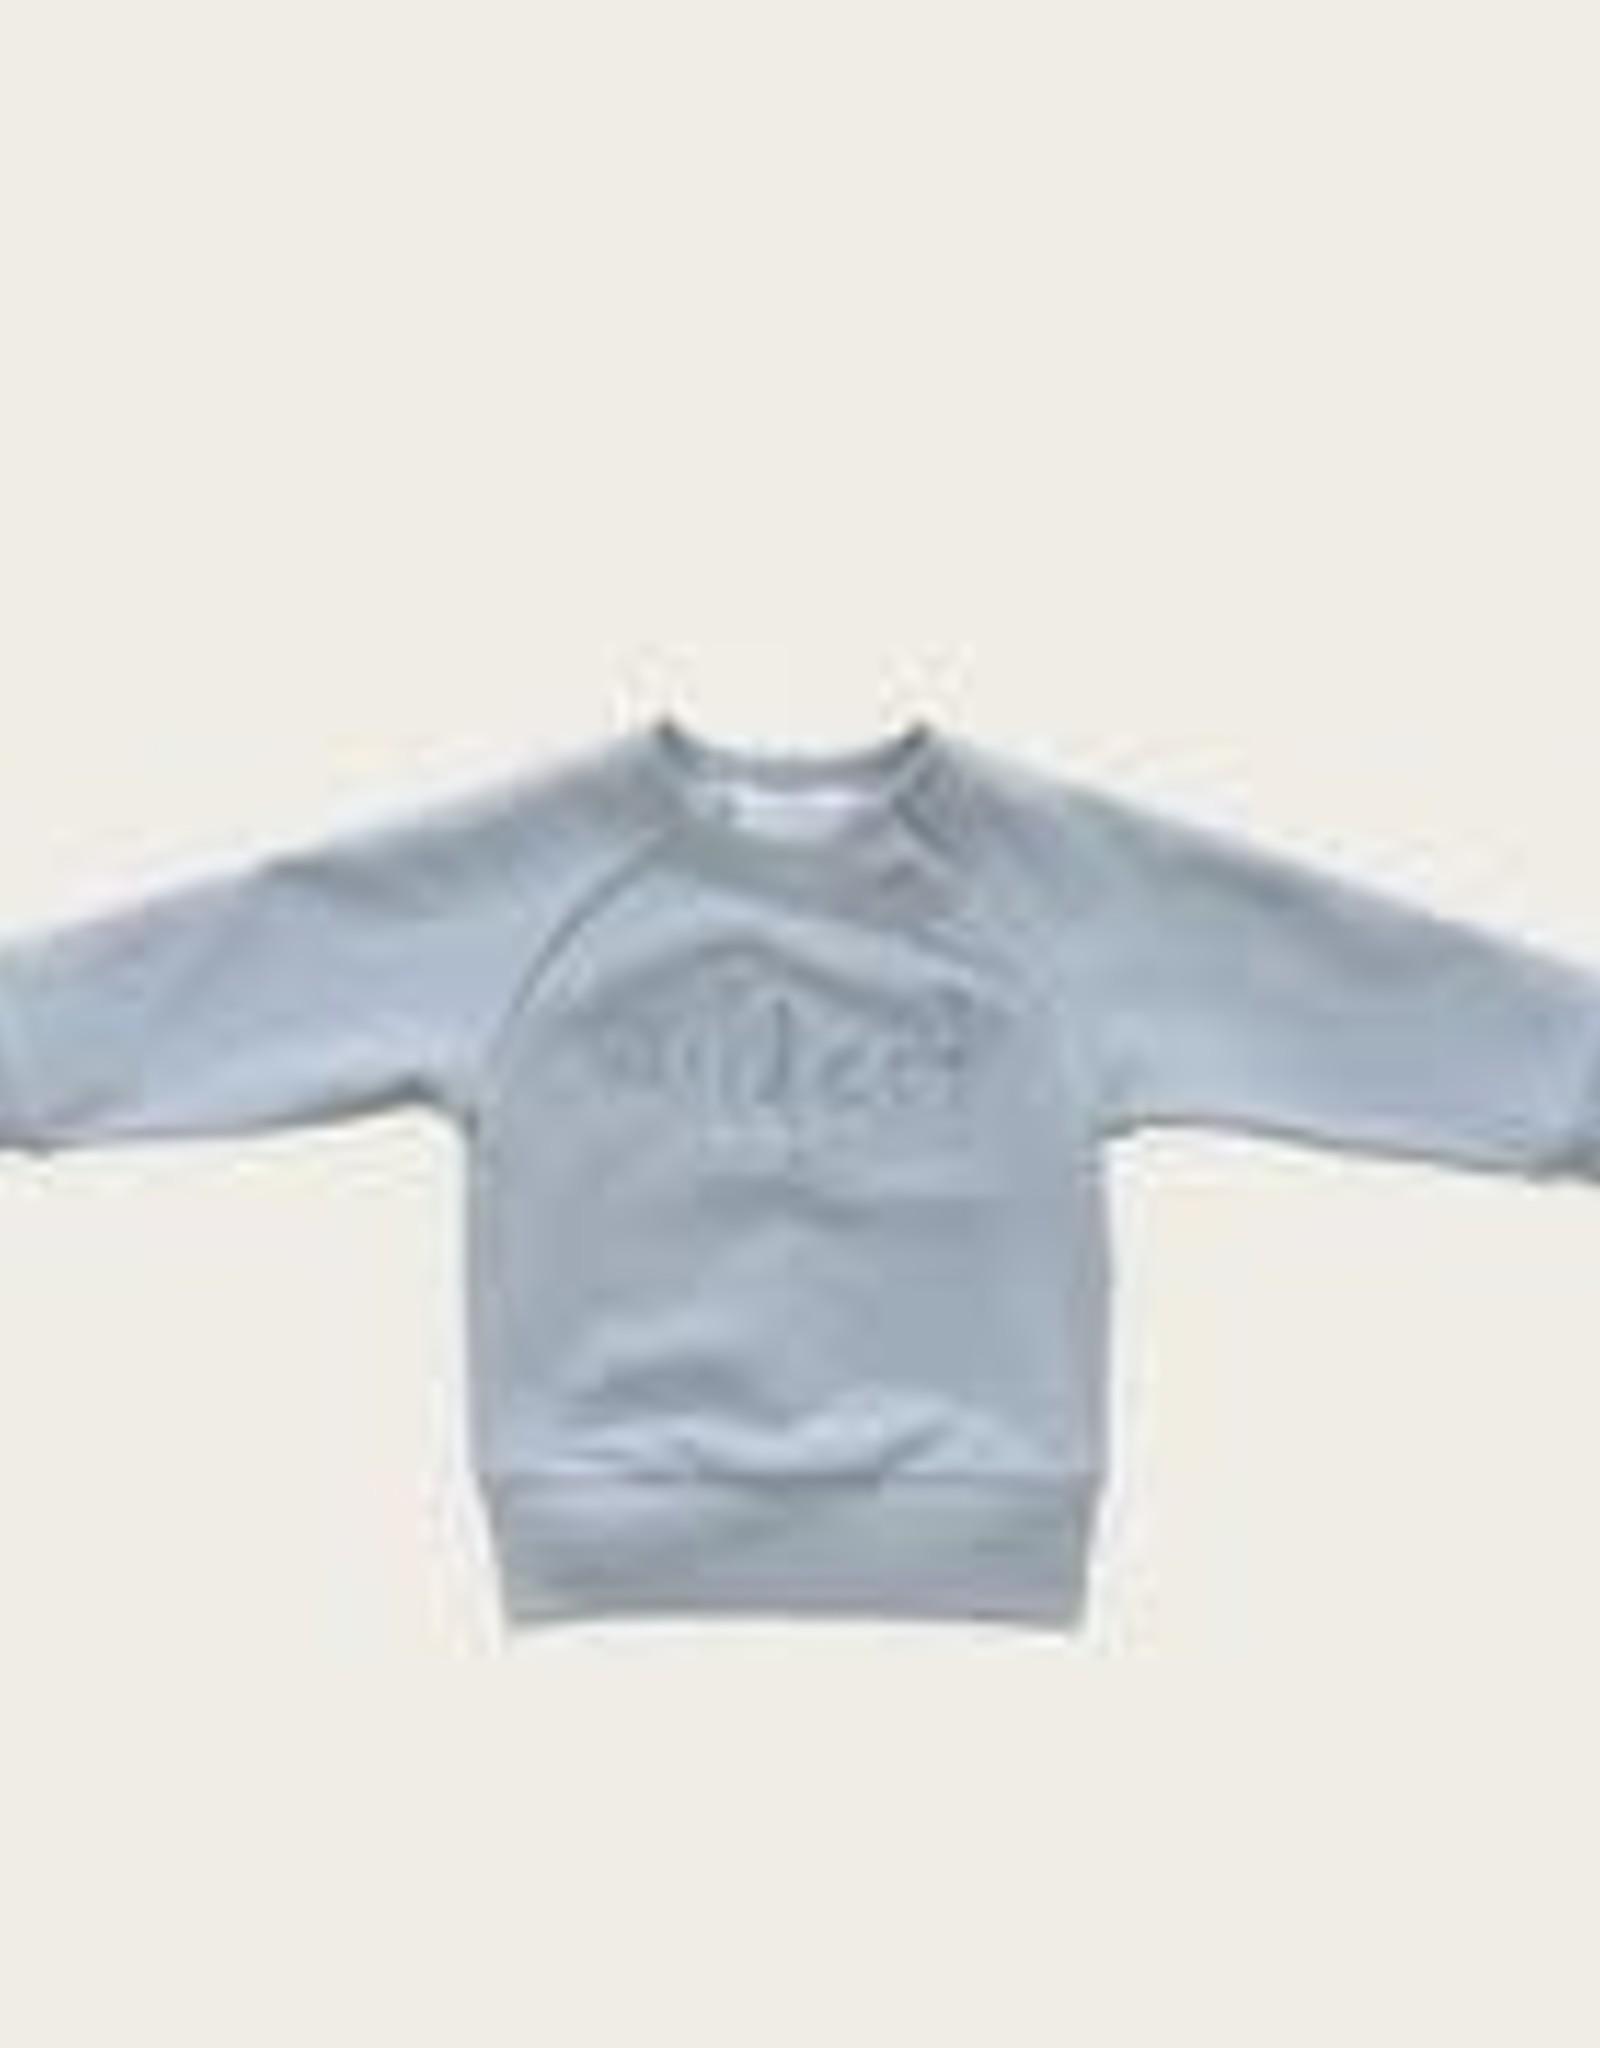 Jamie Kay Wildest Sweatshirt